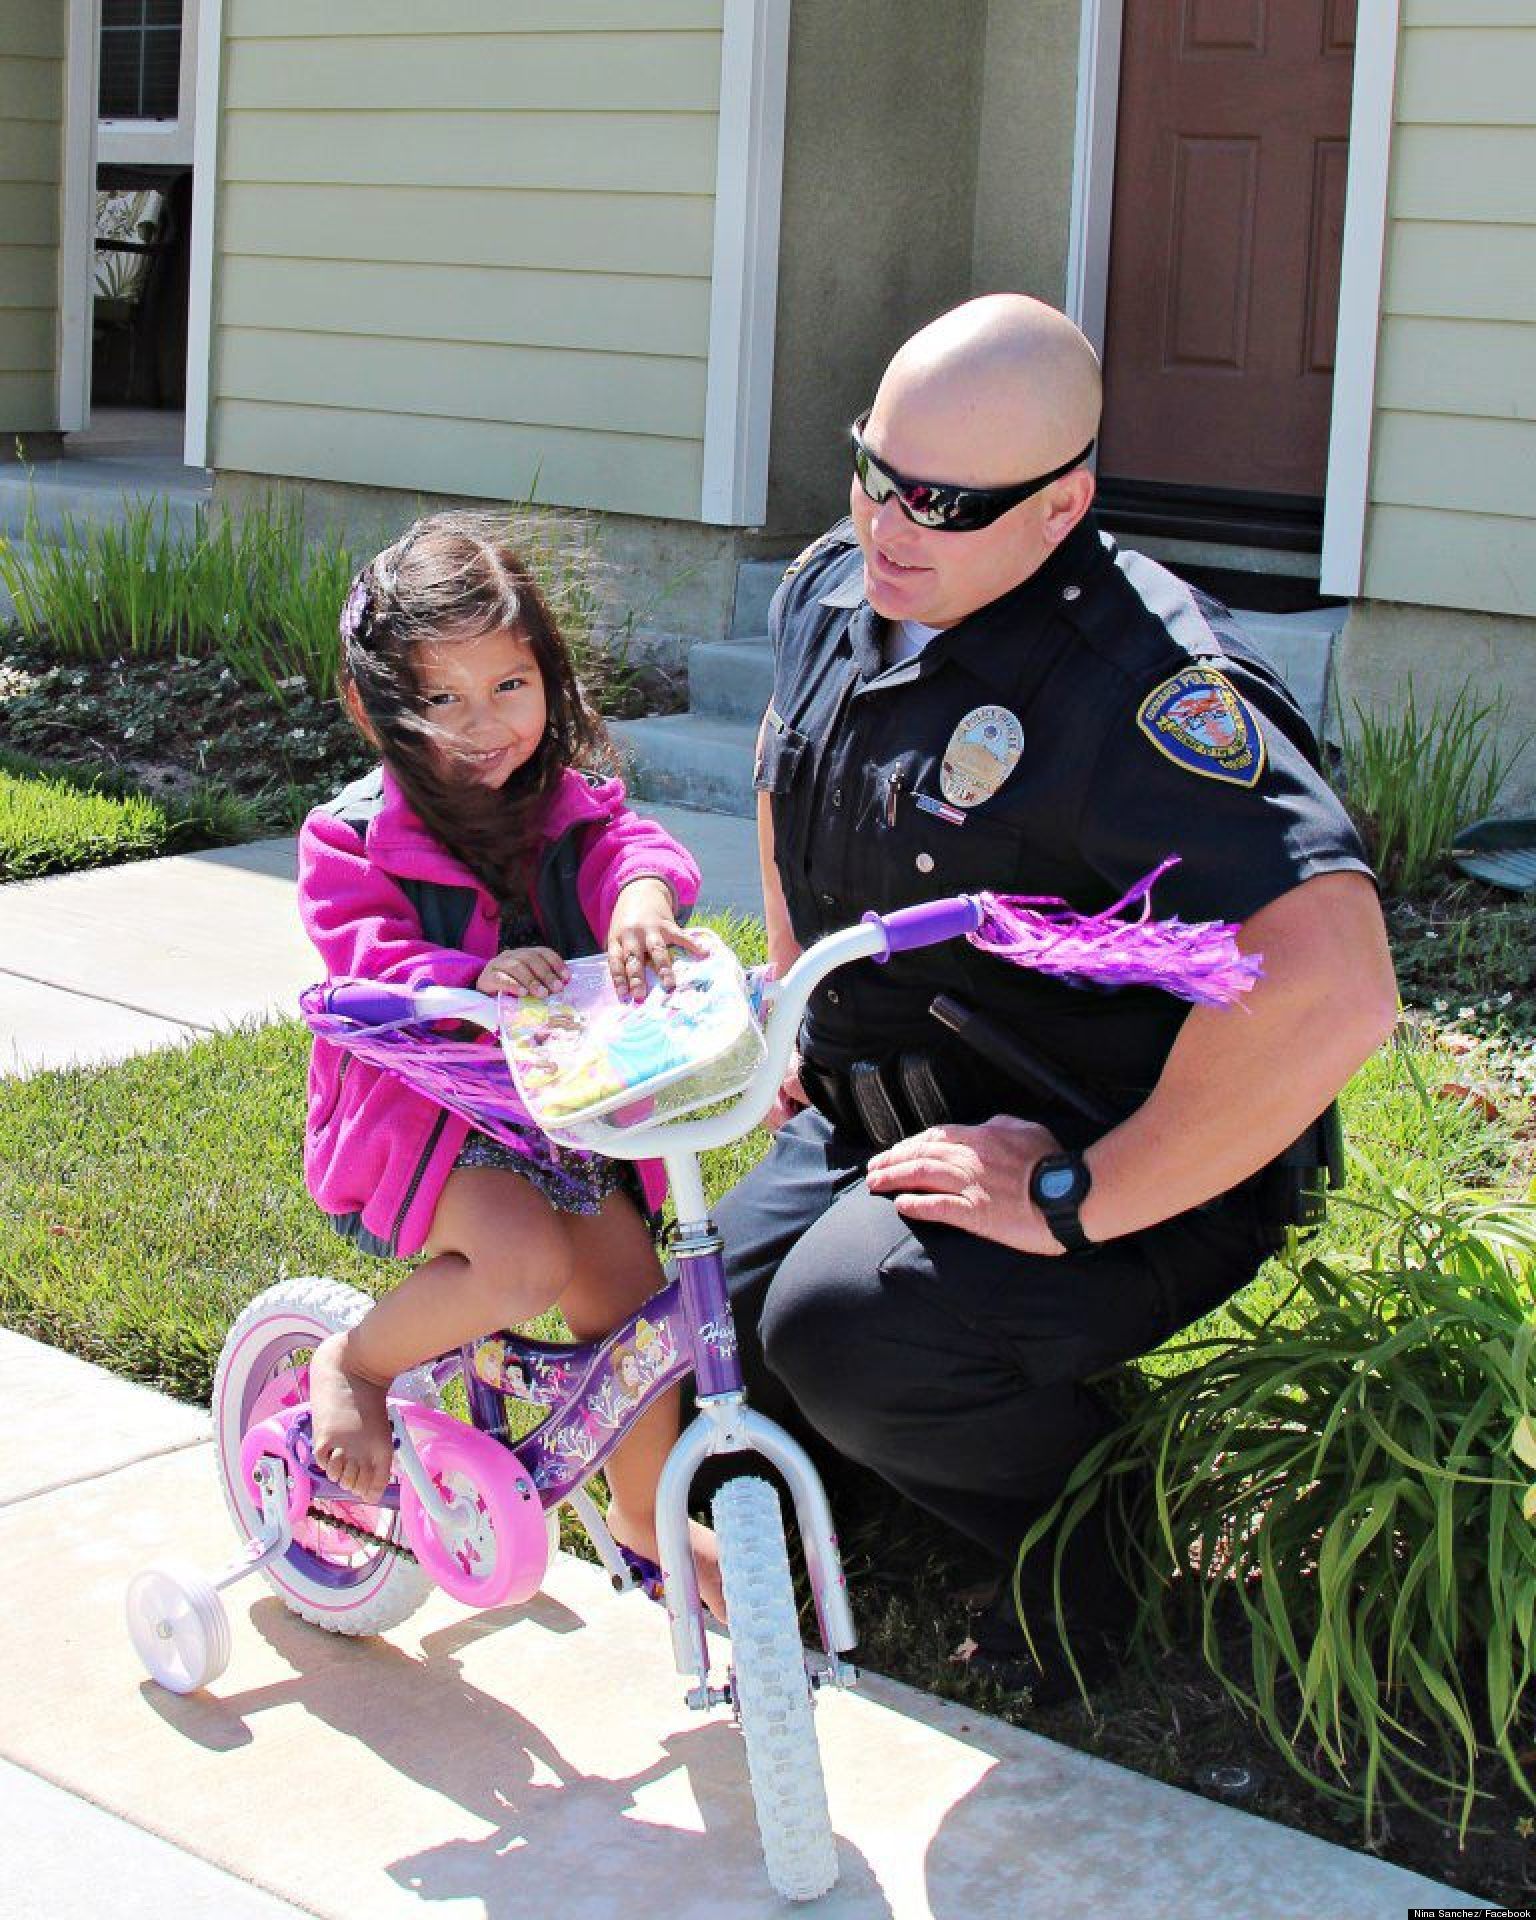 Cop Photo Goes Viral: Police Officer Michael Kohr Treats Bella Sanchez To New